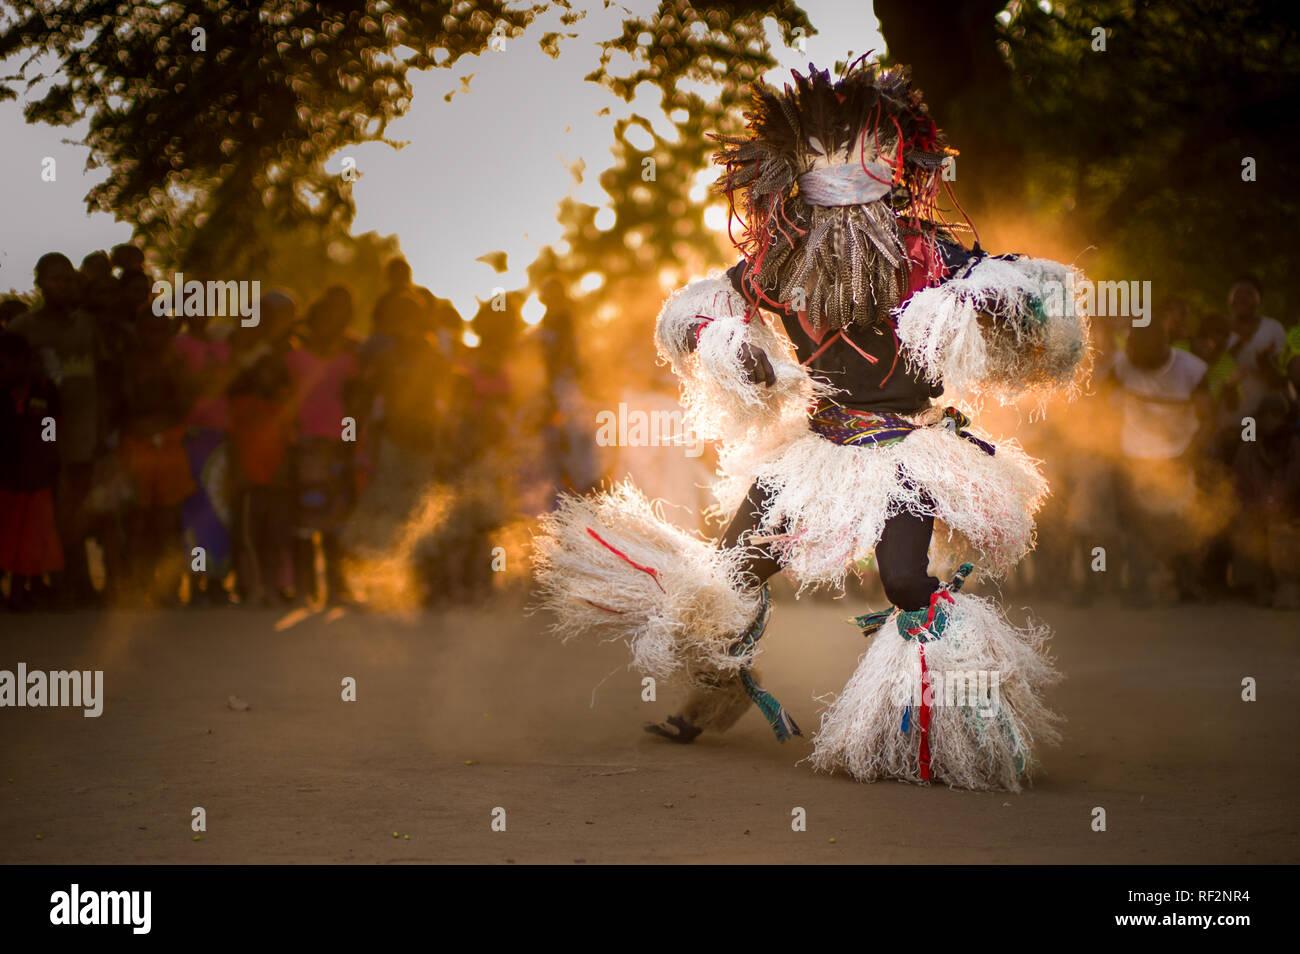 A Gule Wamkulu dancer in an energetic performant near Chikwawa, Malawi; the Gule Wamkulu is a captivating ritual dance performed by a secret society Stock Photo